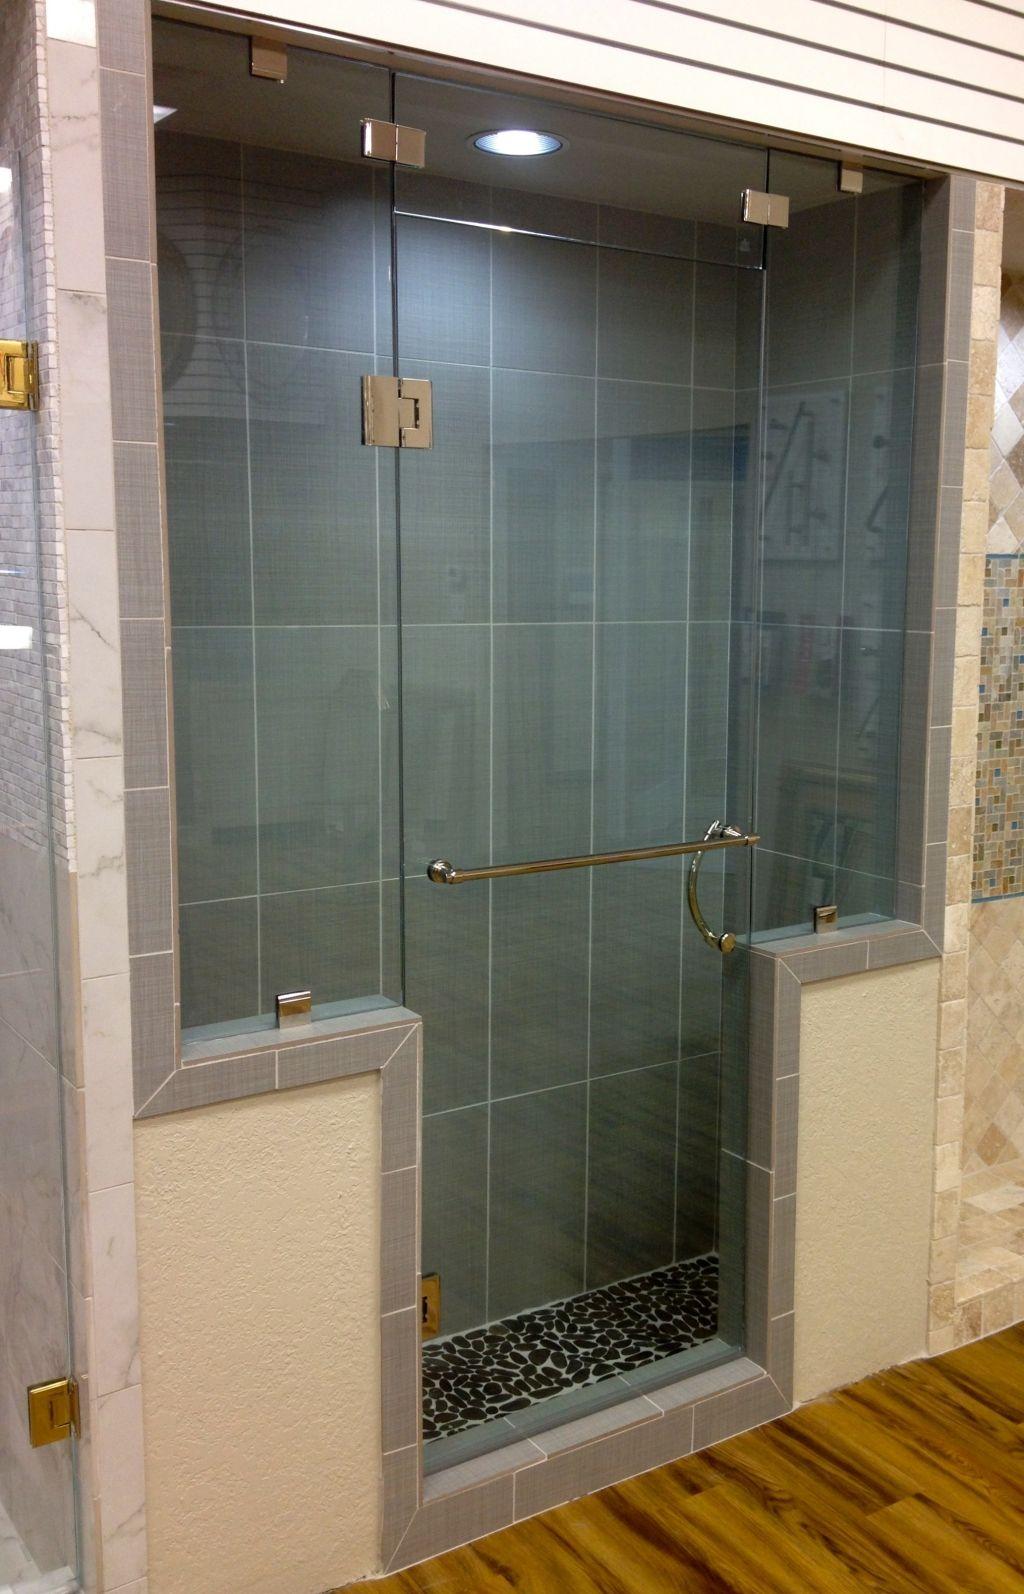 Shower And Steam Room Combination Luxury Modern Steam Shower Units ...